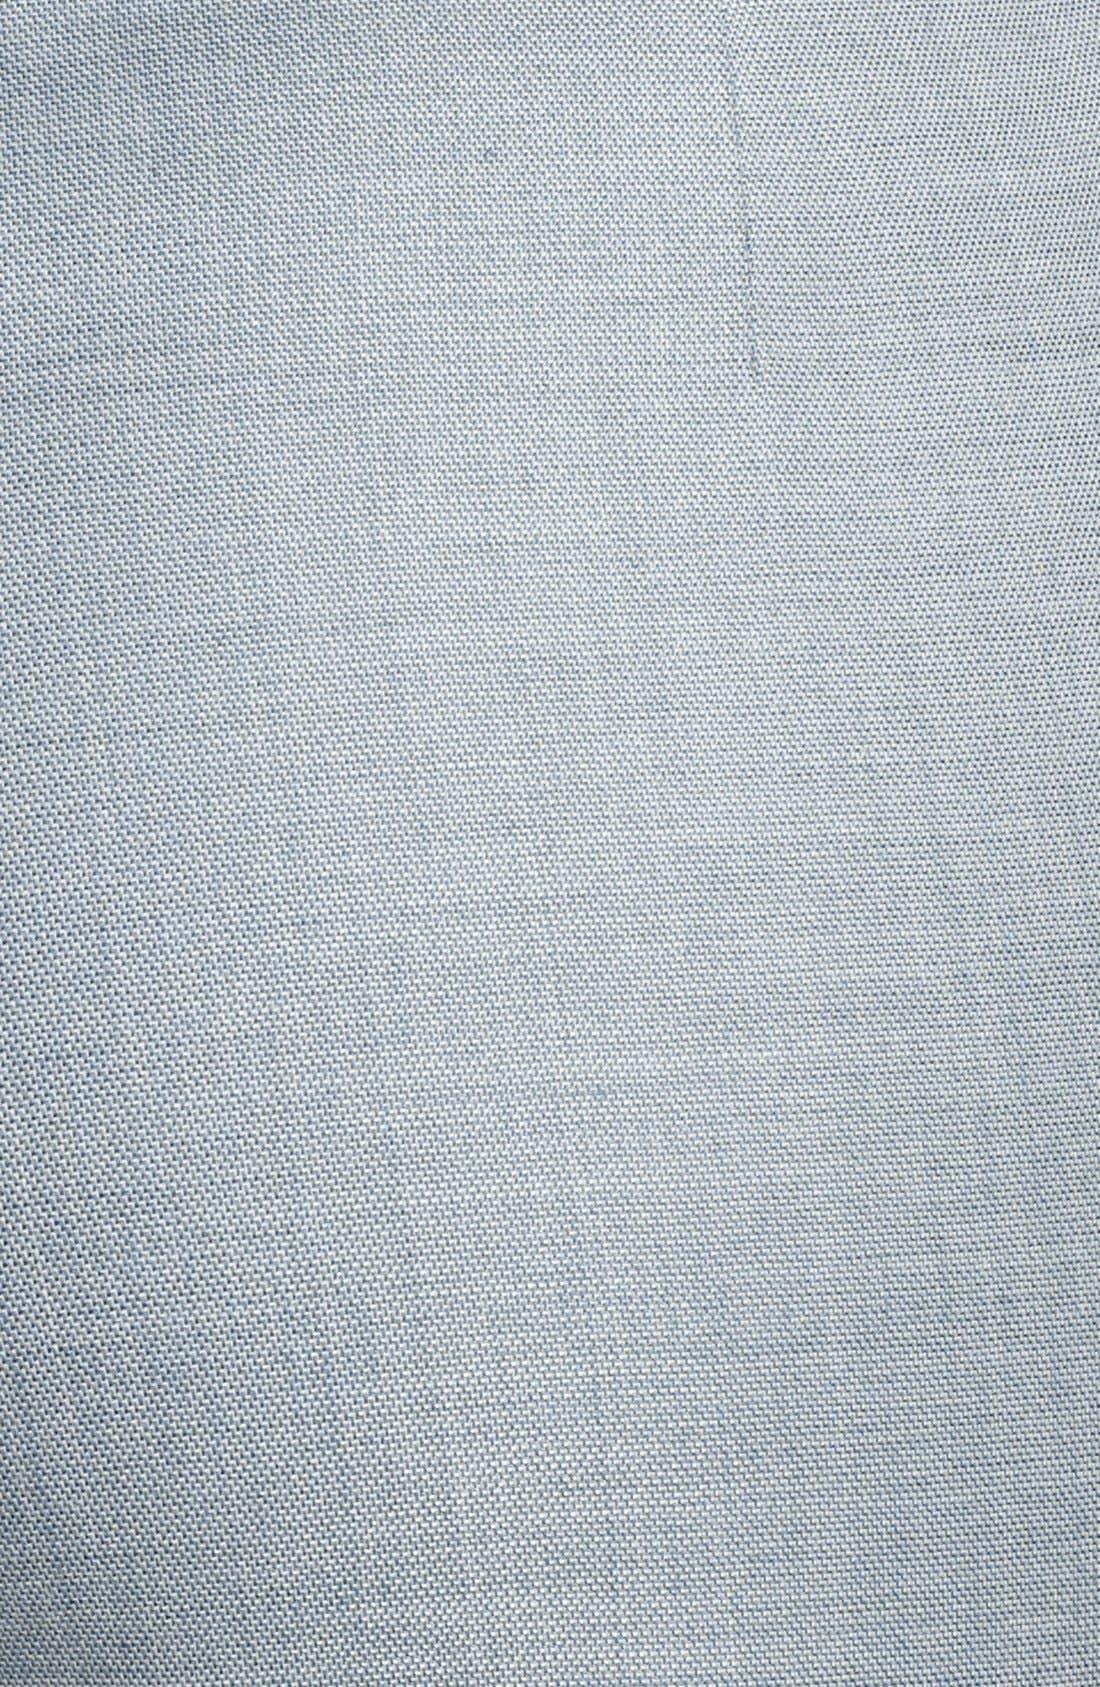 Alternate Image 3  - BOSS HUGO BOSS 'Tillina' Stretch Wool Blend Trousers